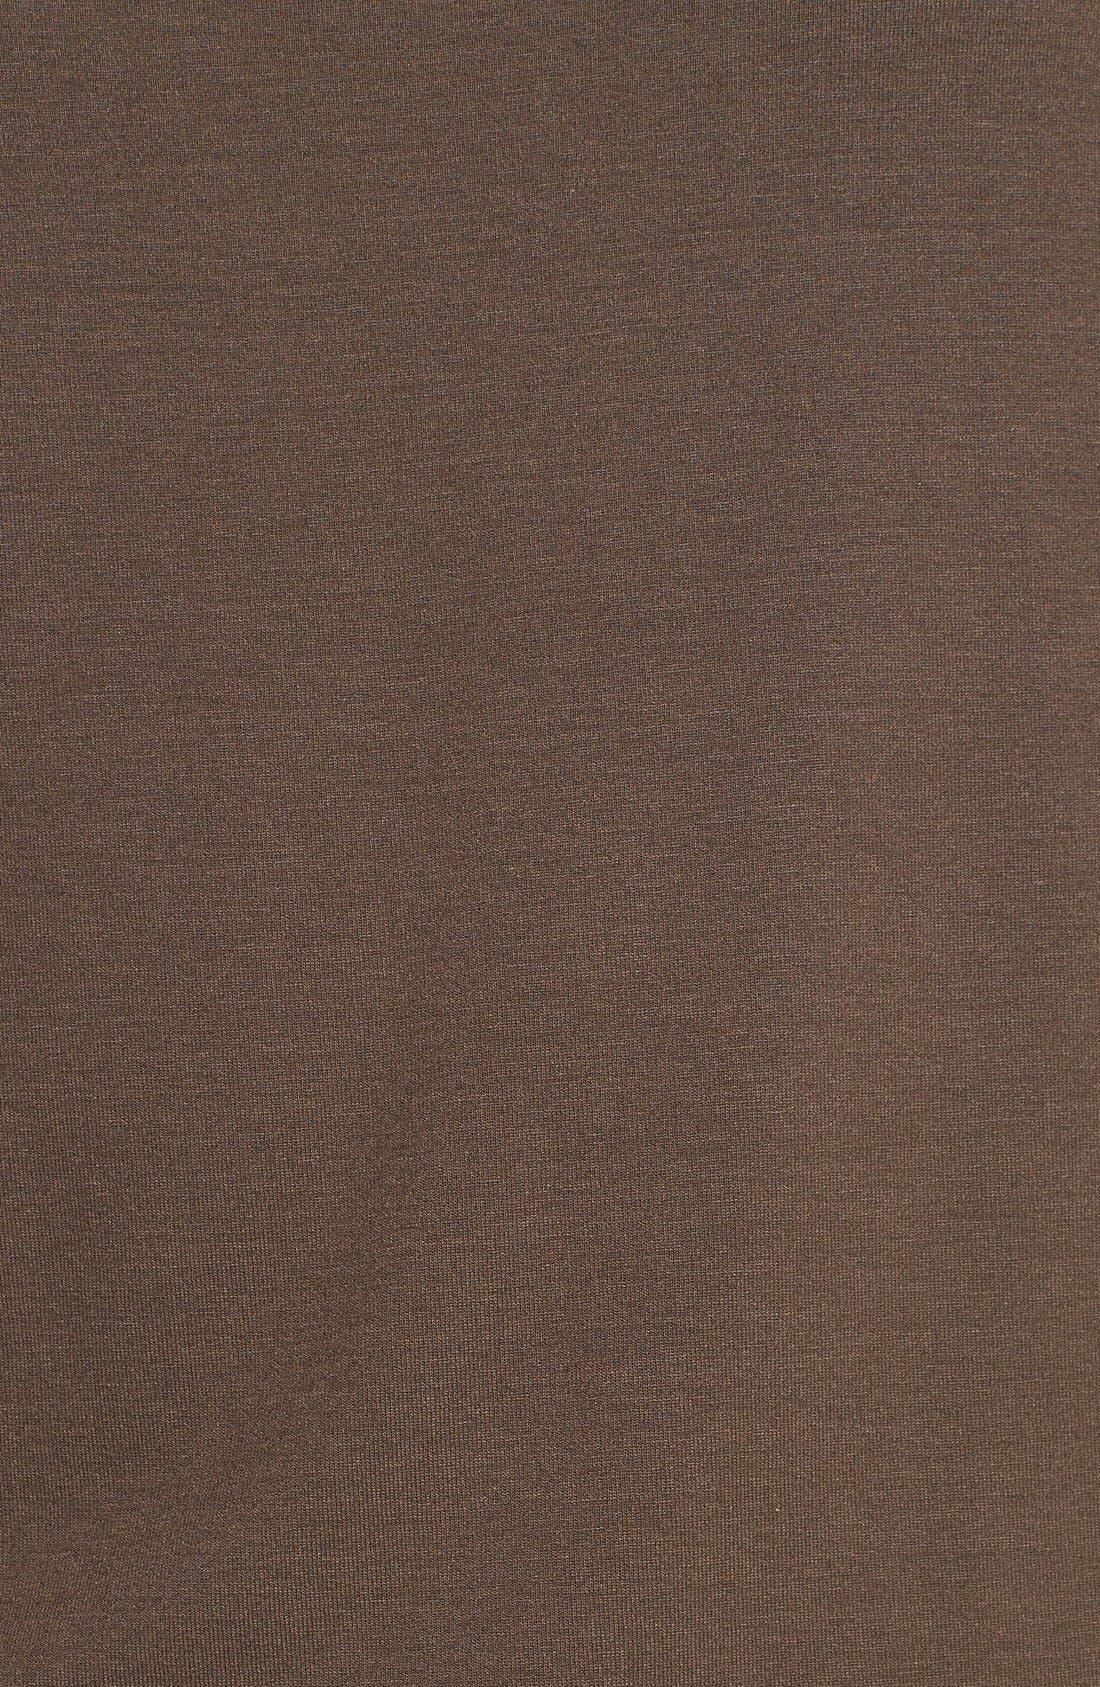 Alternate Image 3  - Eileen Fisher Bateau Neck Slim Jersey Top (Regular & Petite)